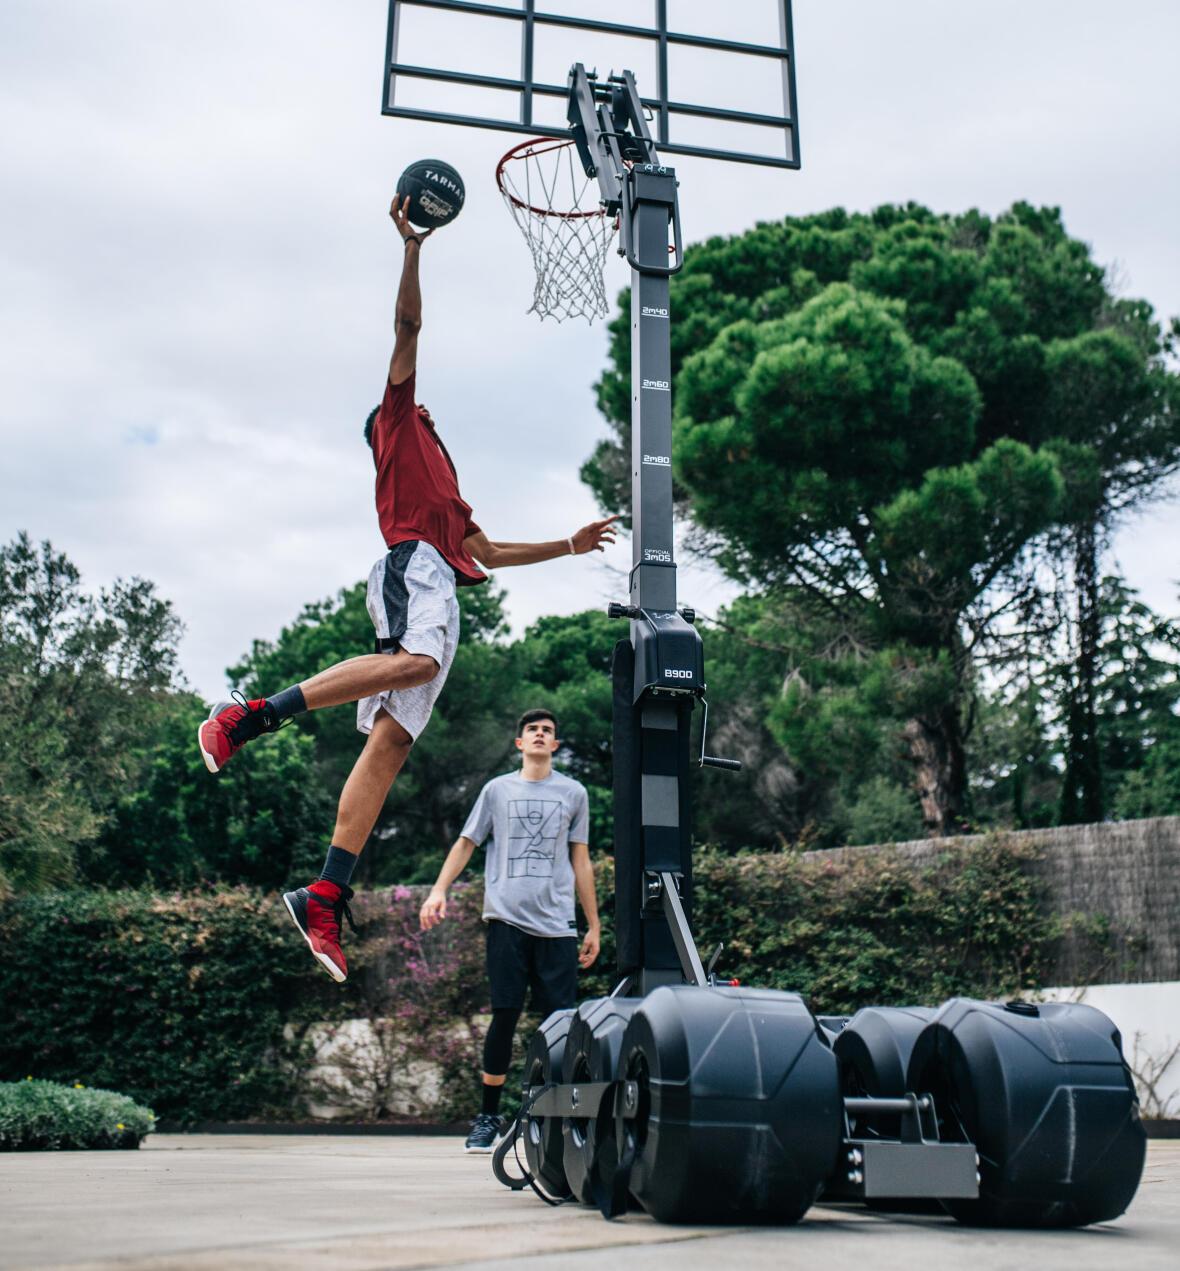 B900basketballhoop